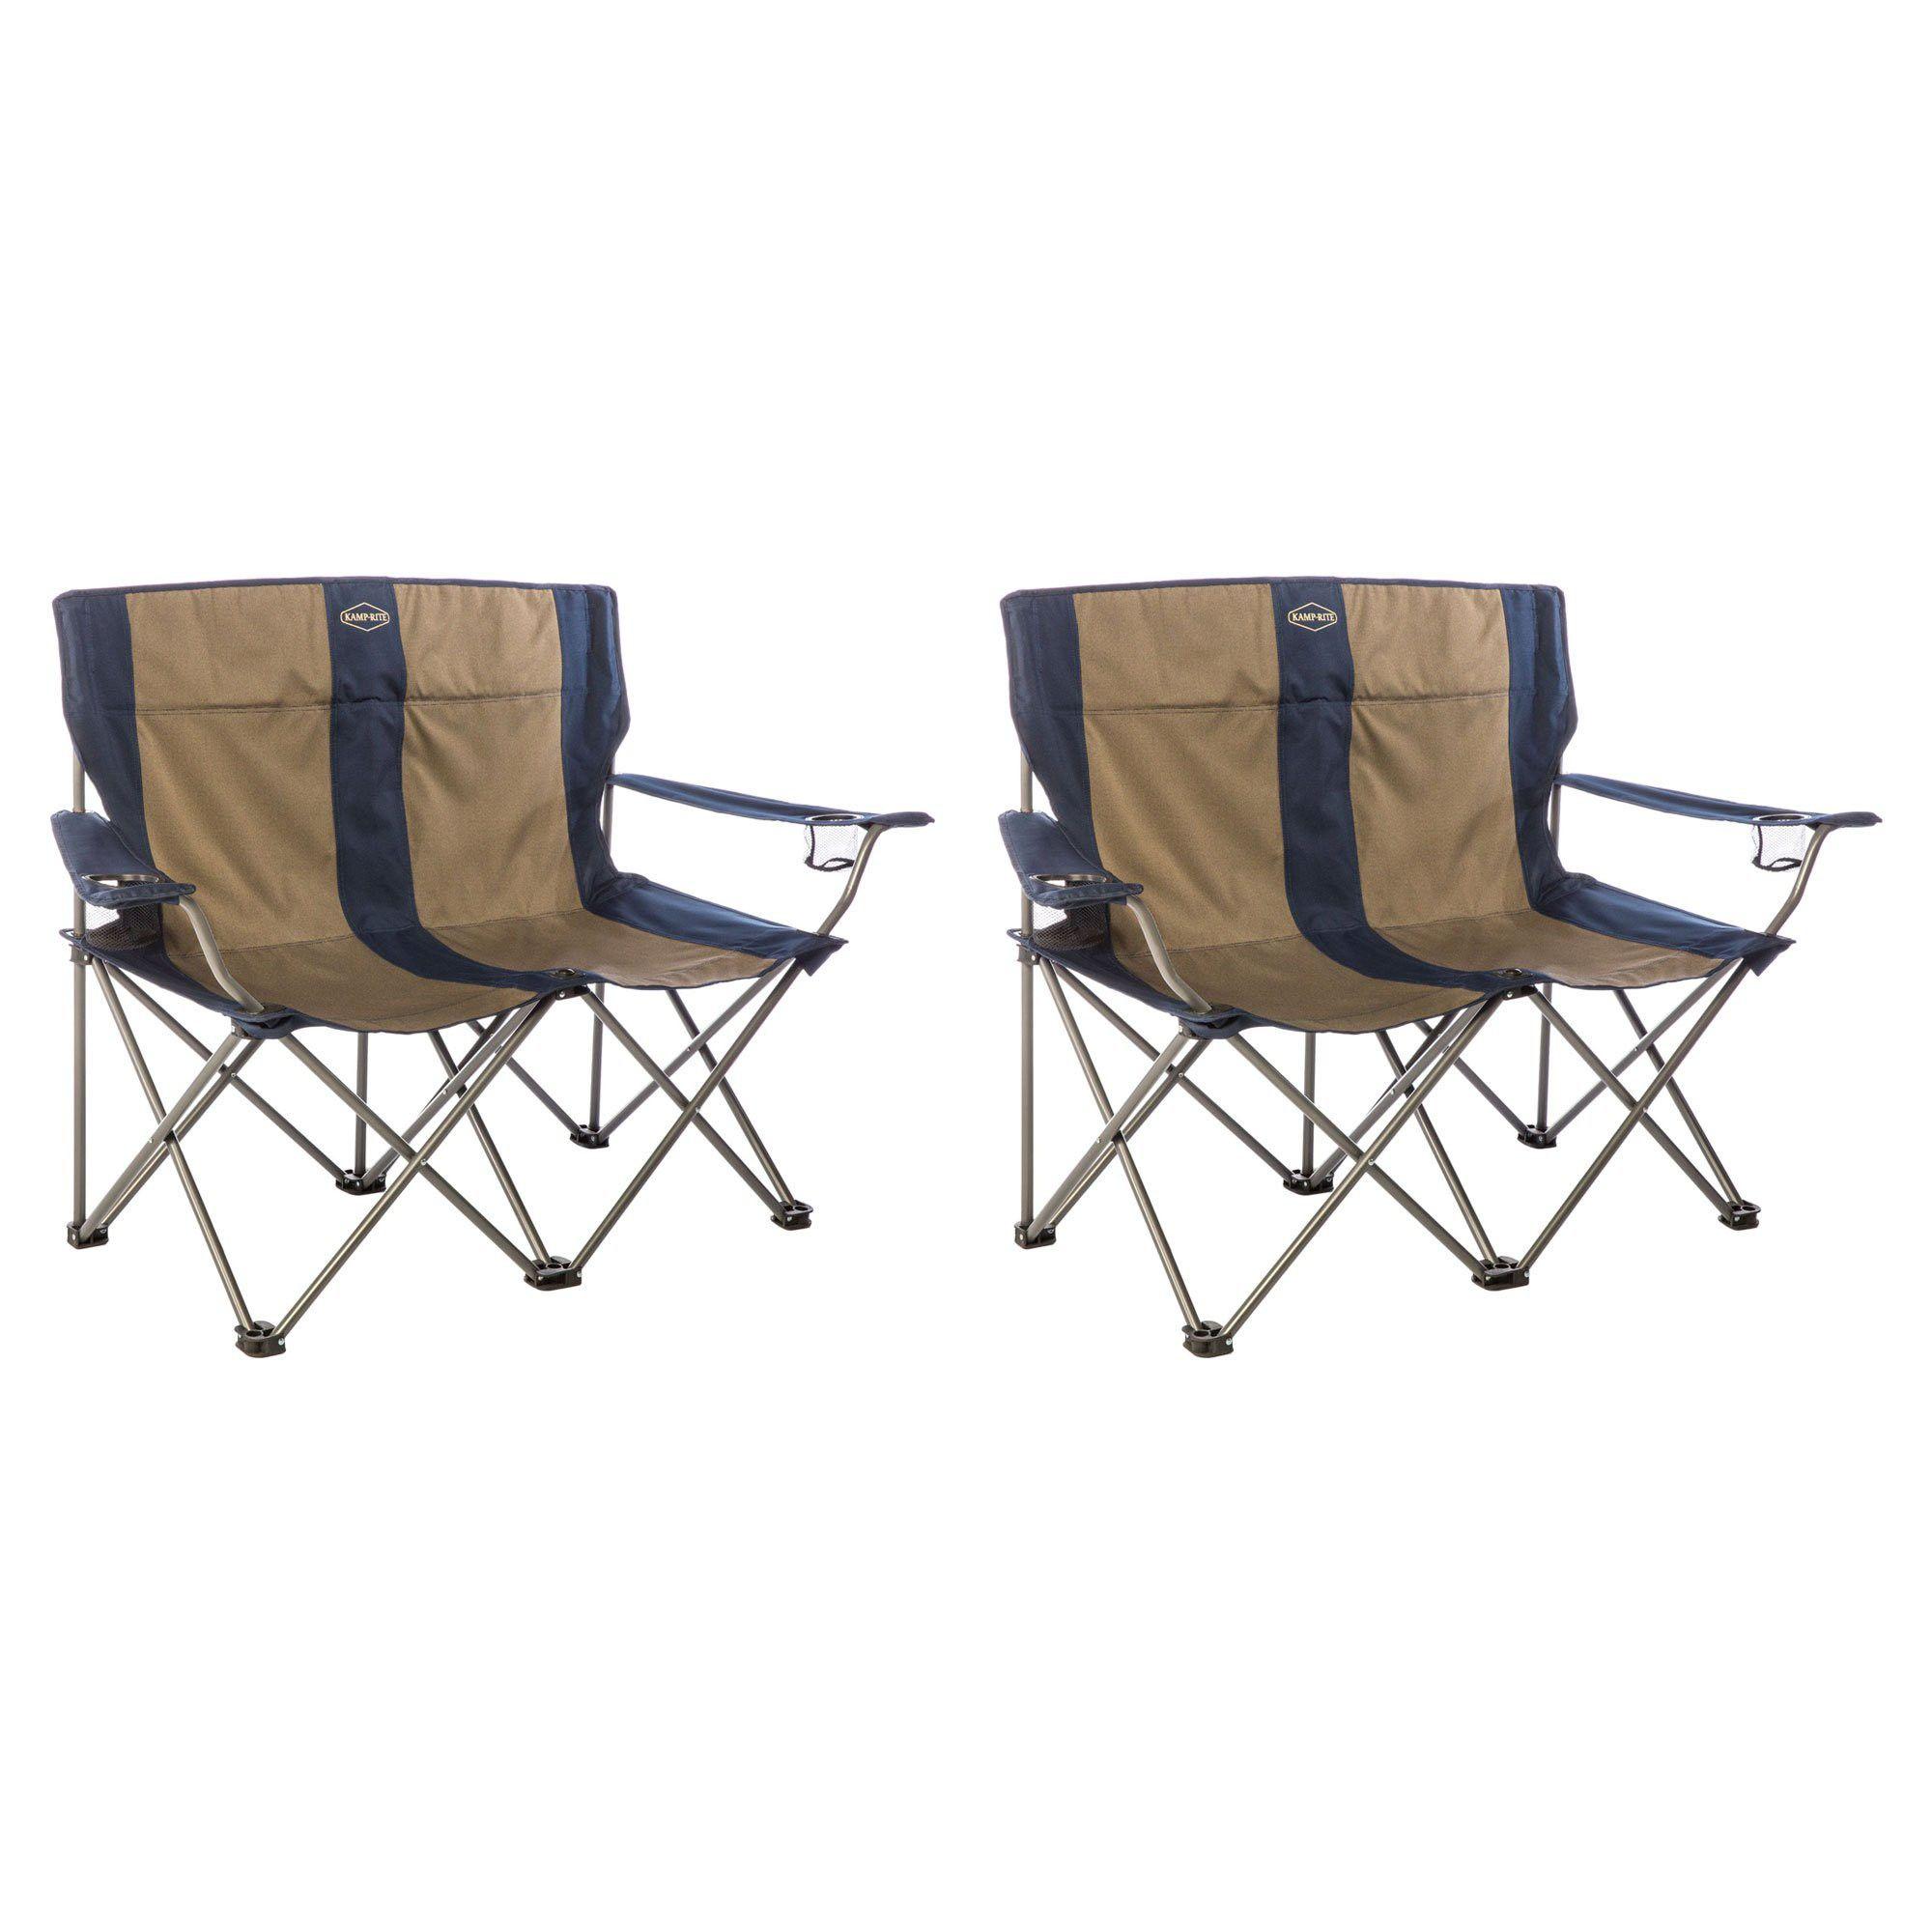 Astounding Chairs Kamp Rite Folding Rocking Chair Sports Outdoors Dailytribune Chair Design For Home Dailytribuneorg